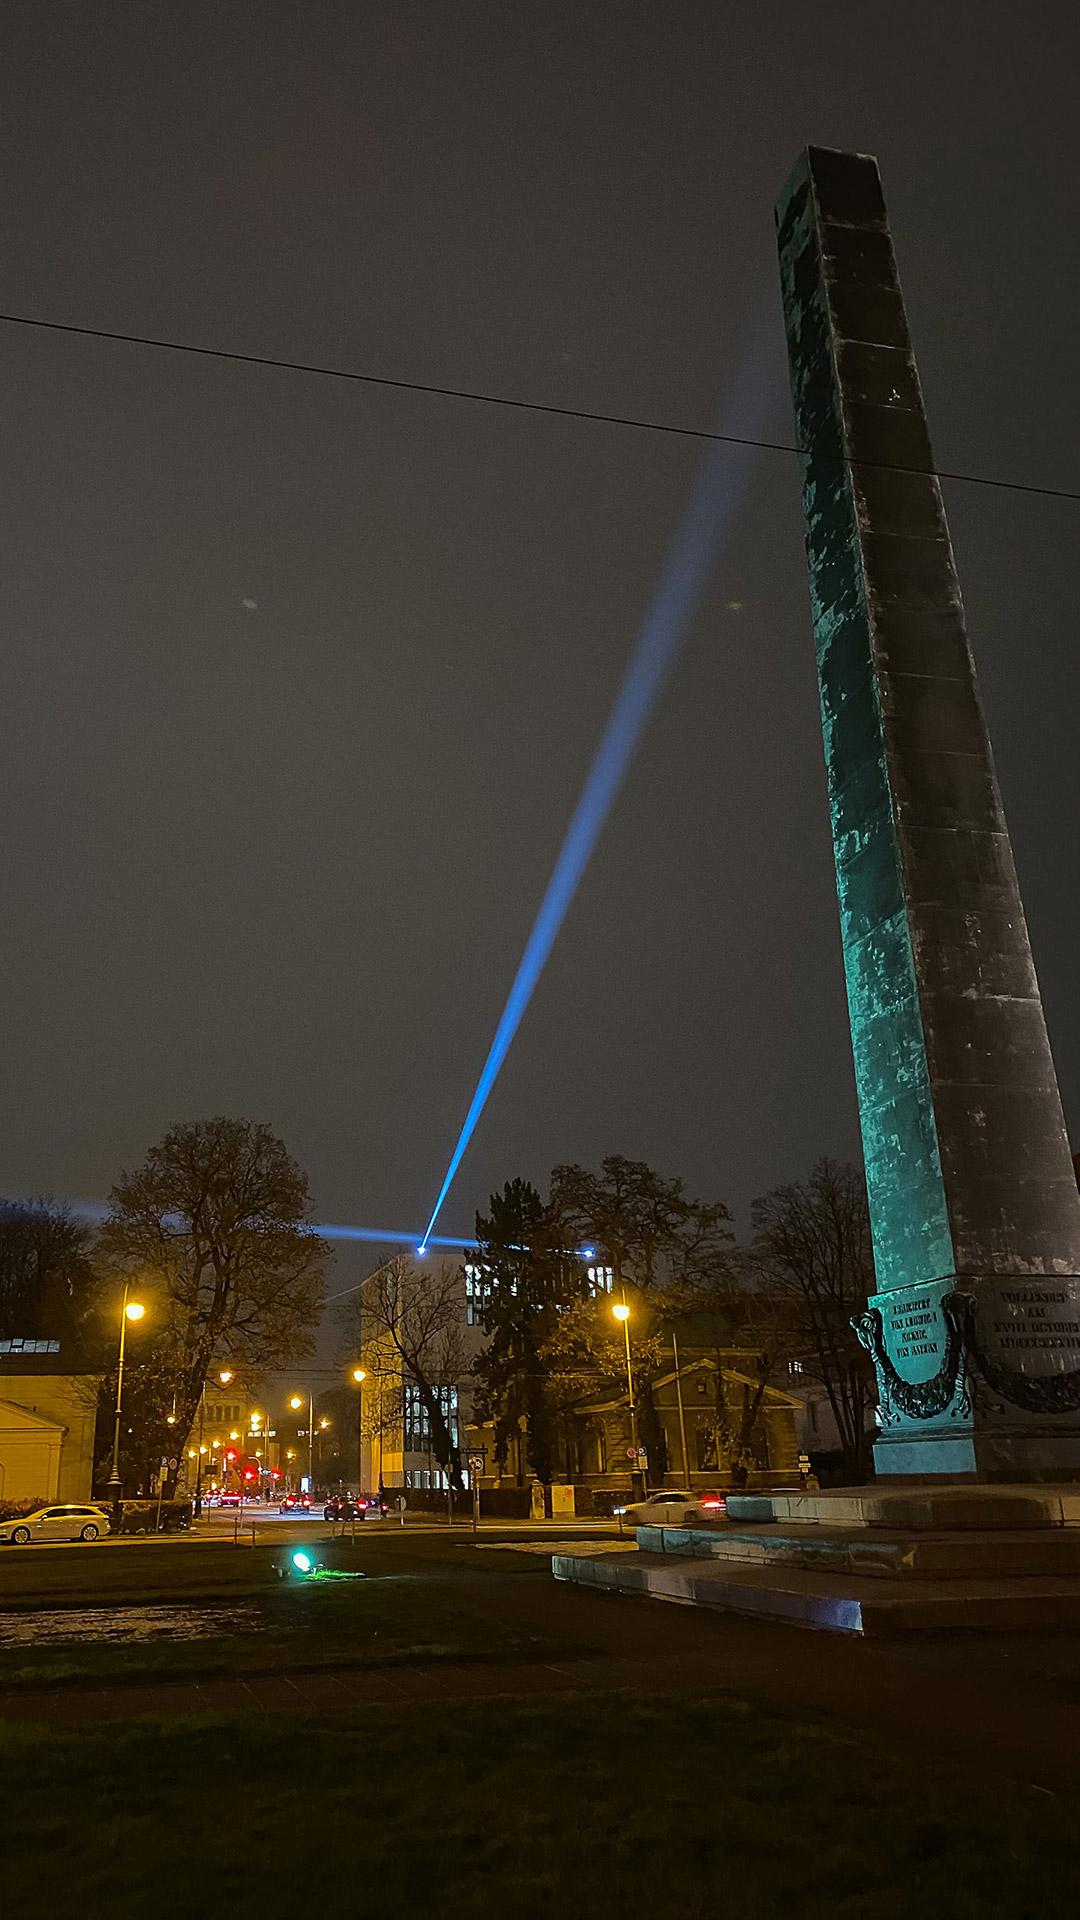 Karolinenplatz Lichtaktion Kunstareal BEAMS